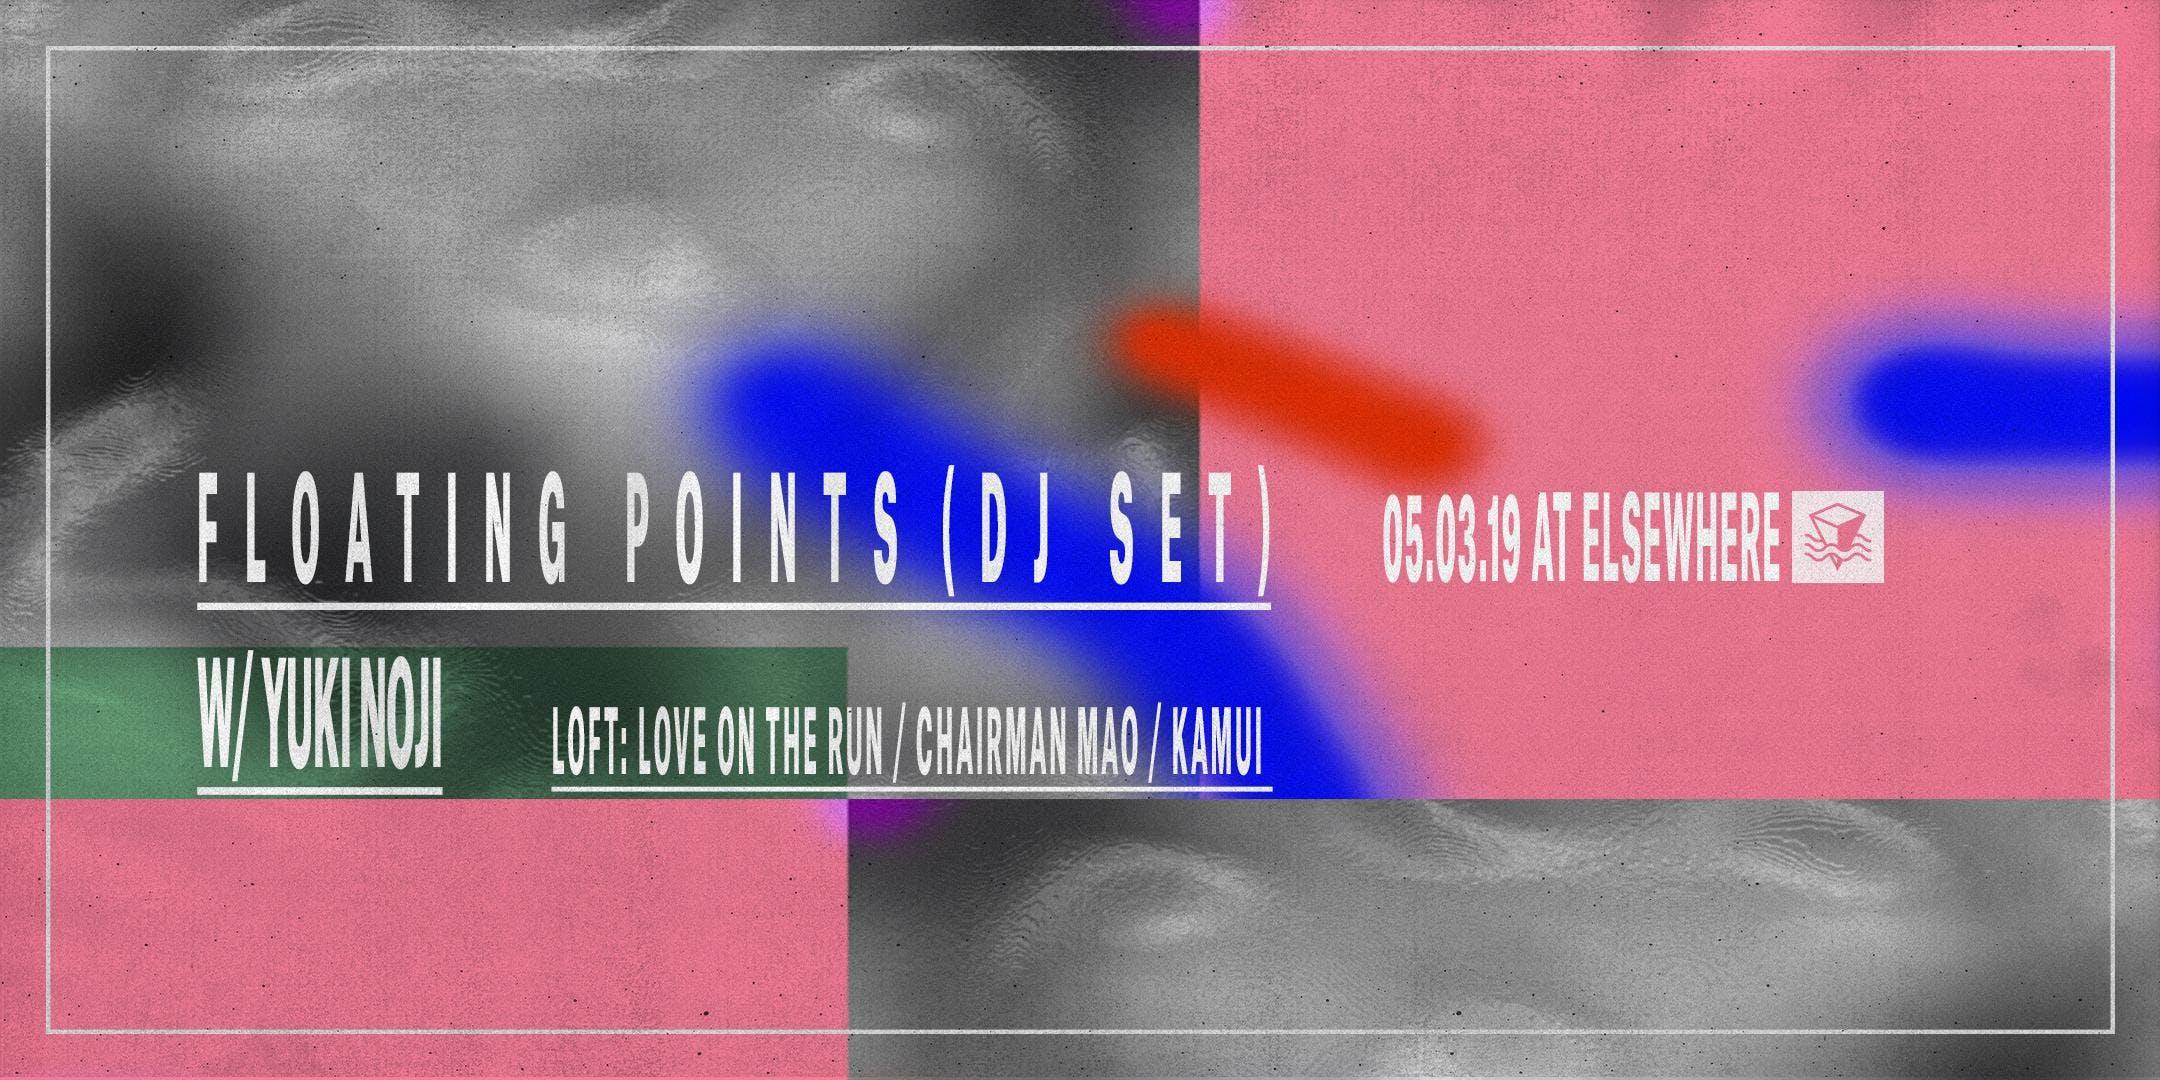 Floating Points (DJ Set), Yuki Noji, Love on The Run B2B Chairman Mao B2B Kamui